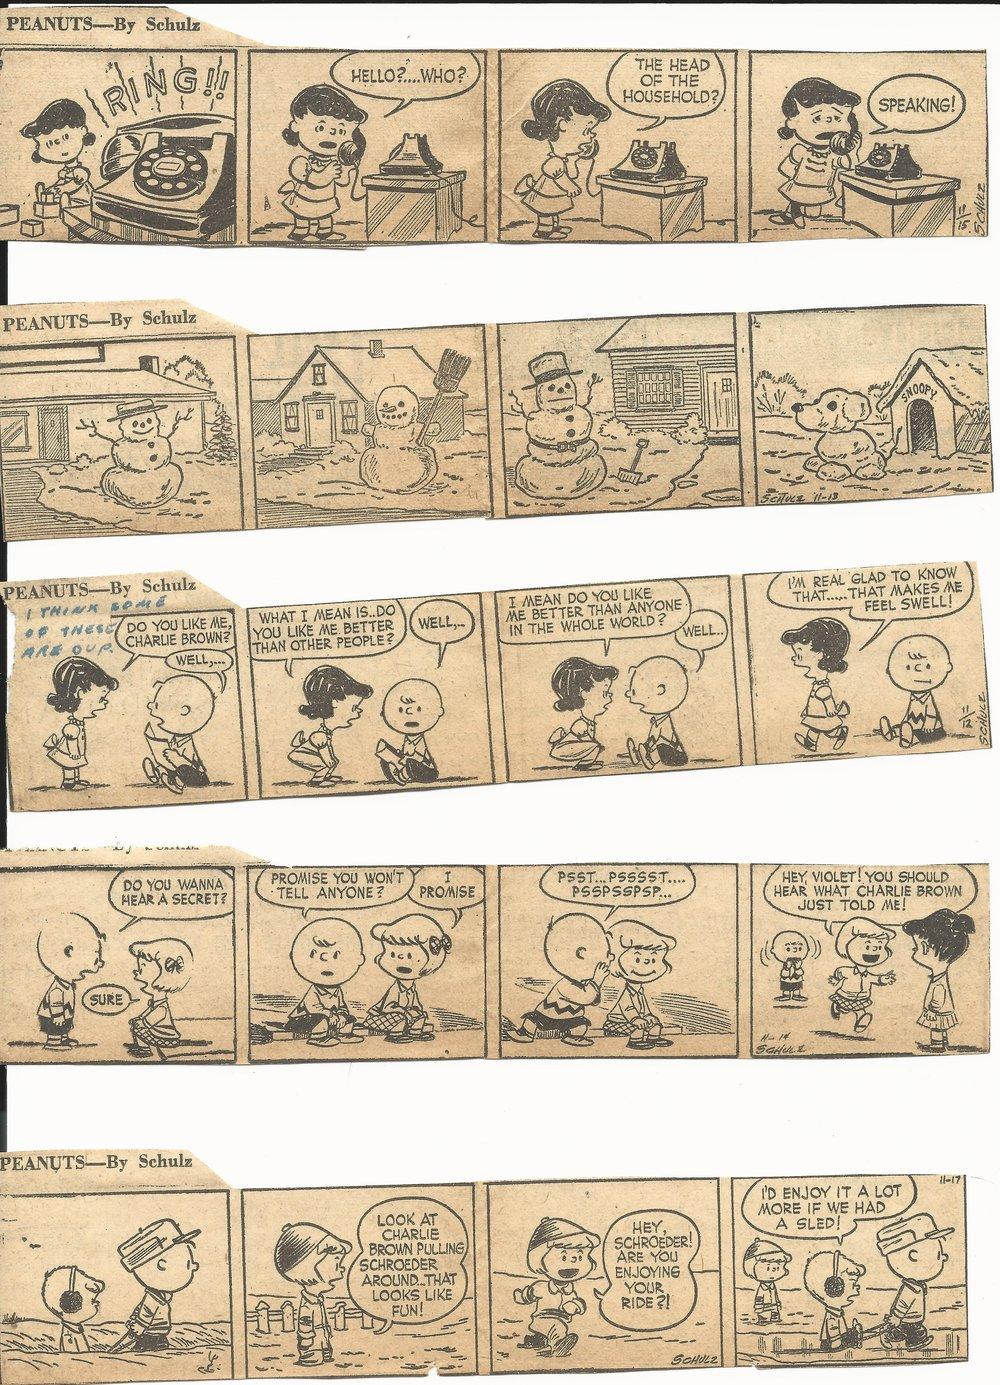 8. Nov. 17, 1952 (Oma)_Page_5.jpg